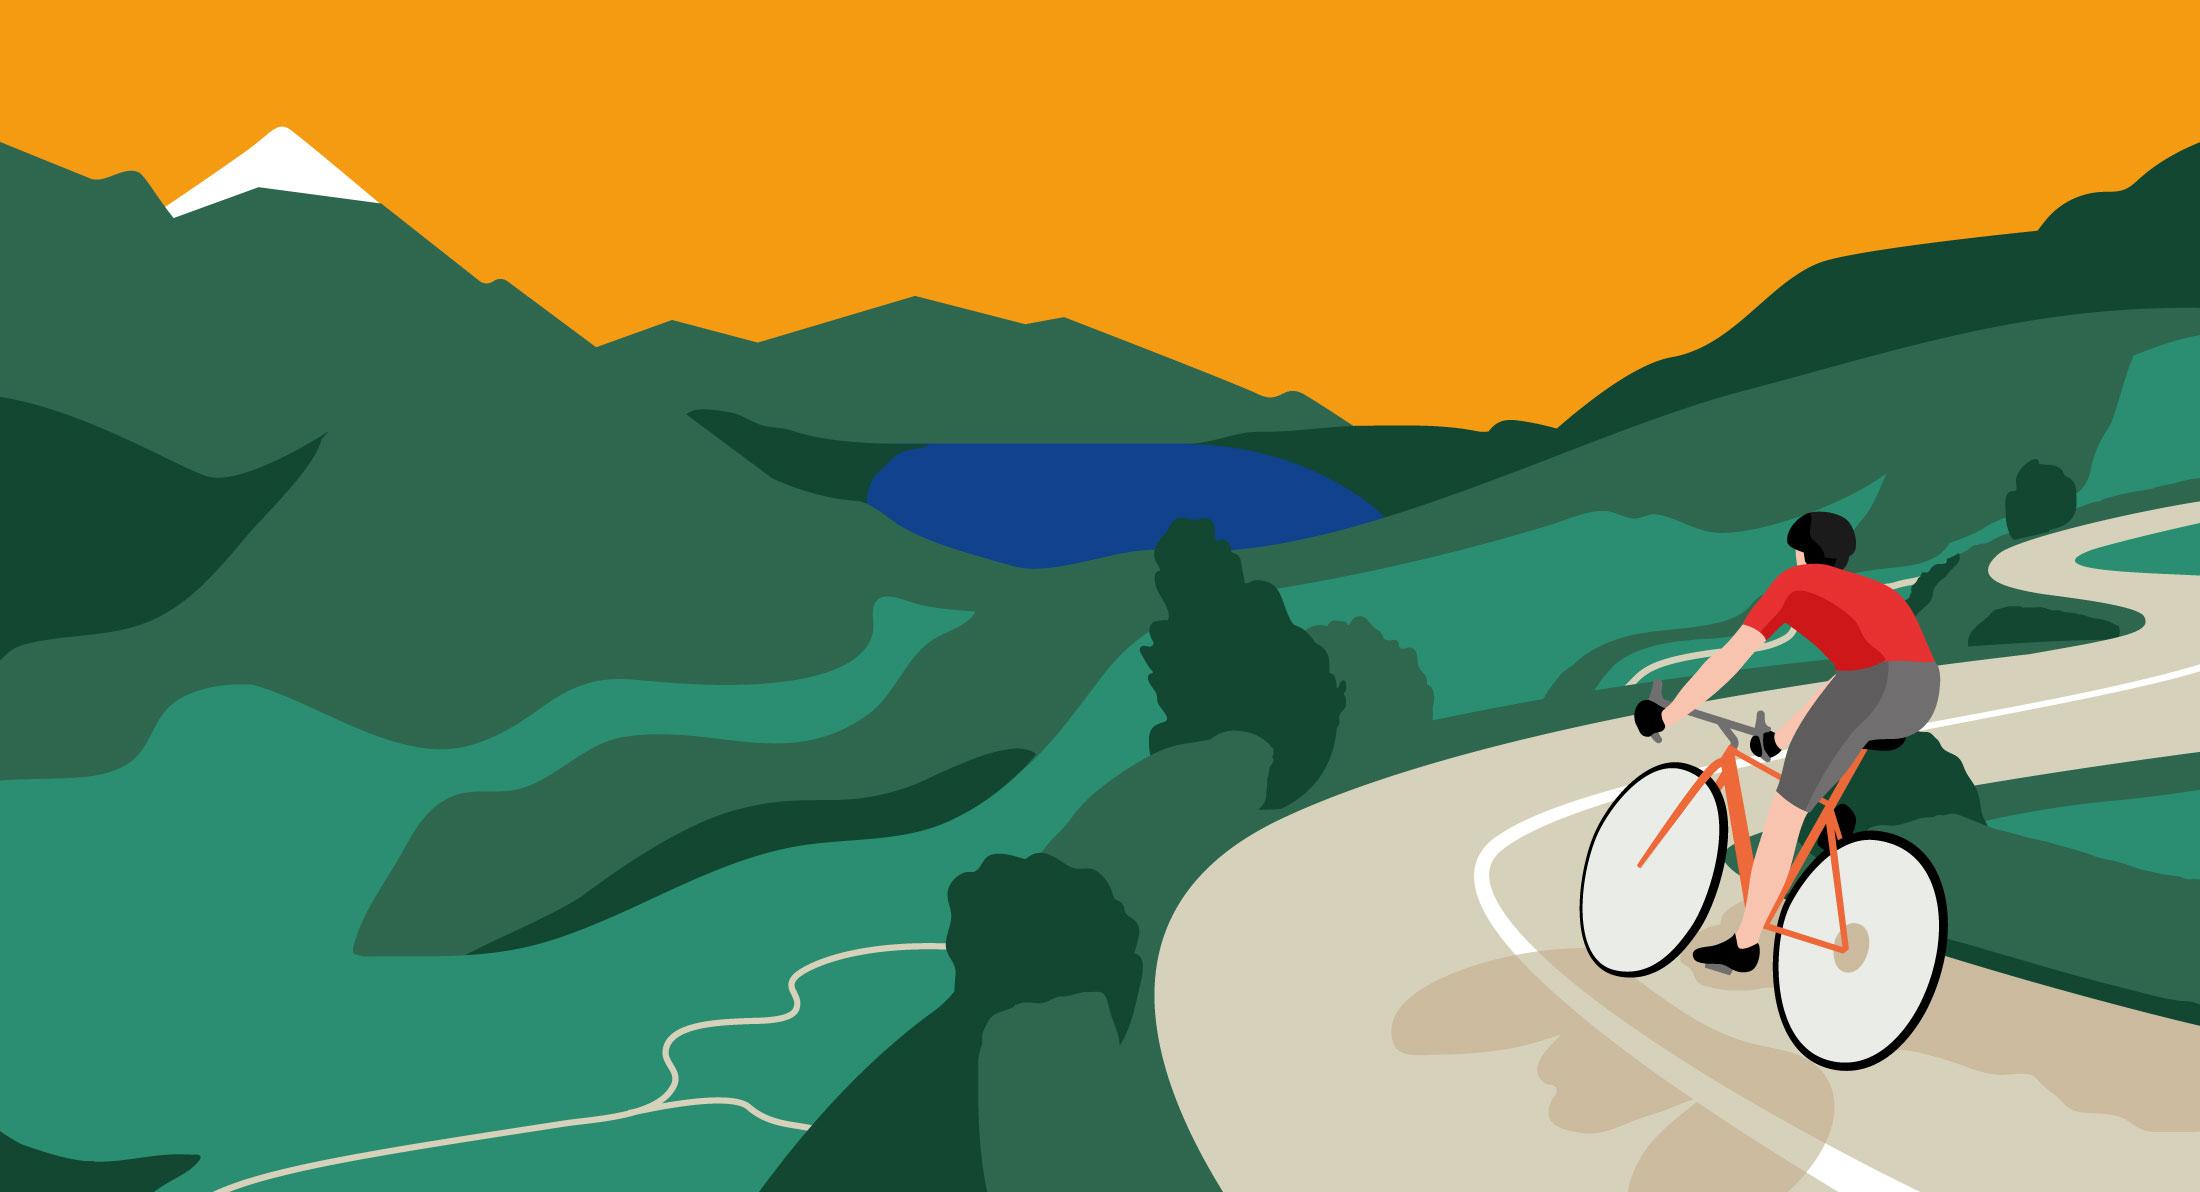 justbenice-o12chocolate-illustration1.jpg